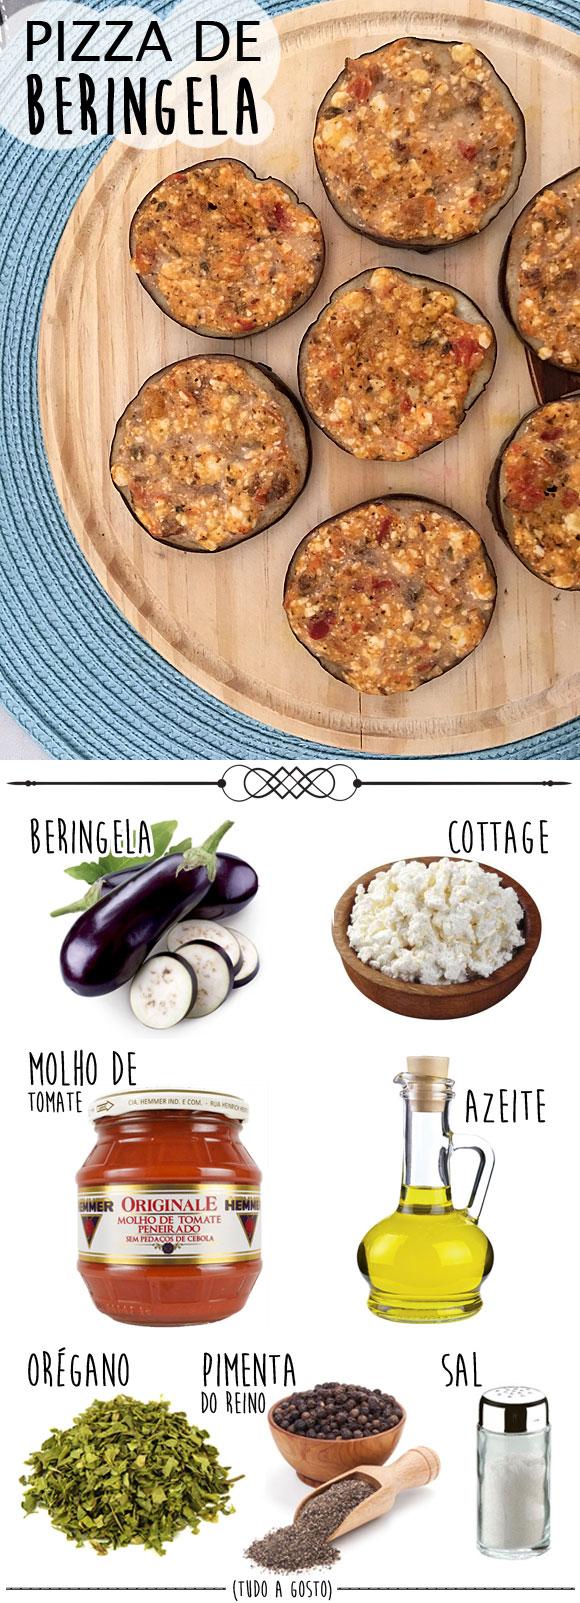 berinjela-pizza-receita-light-delicia-3